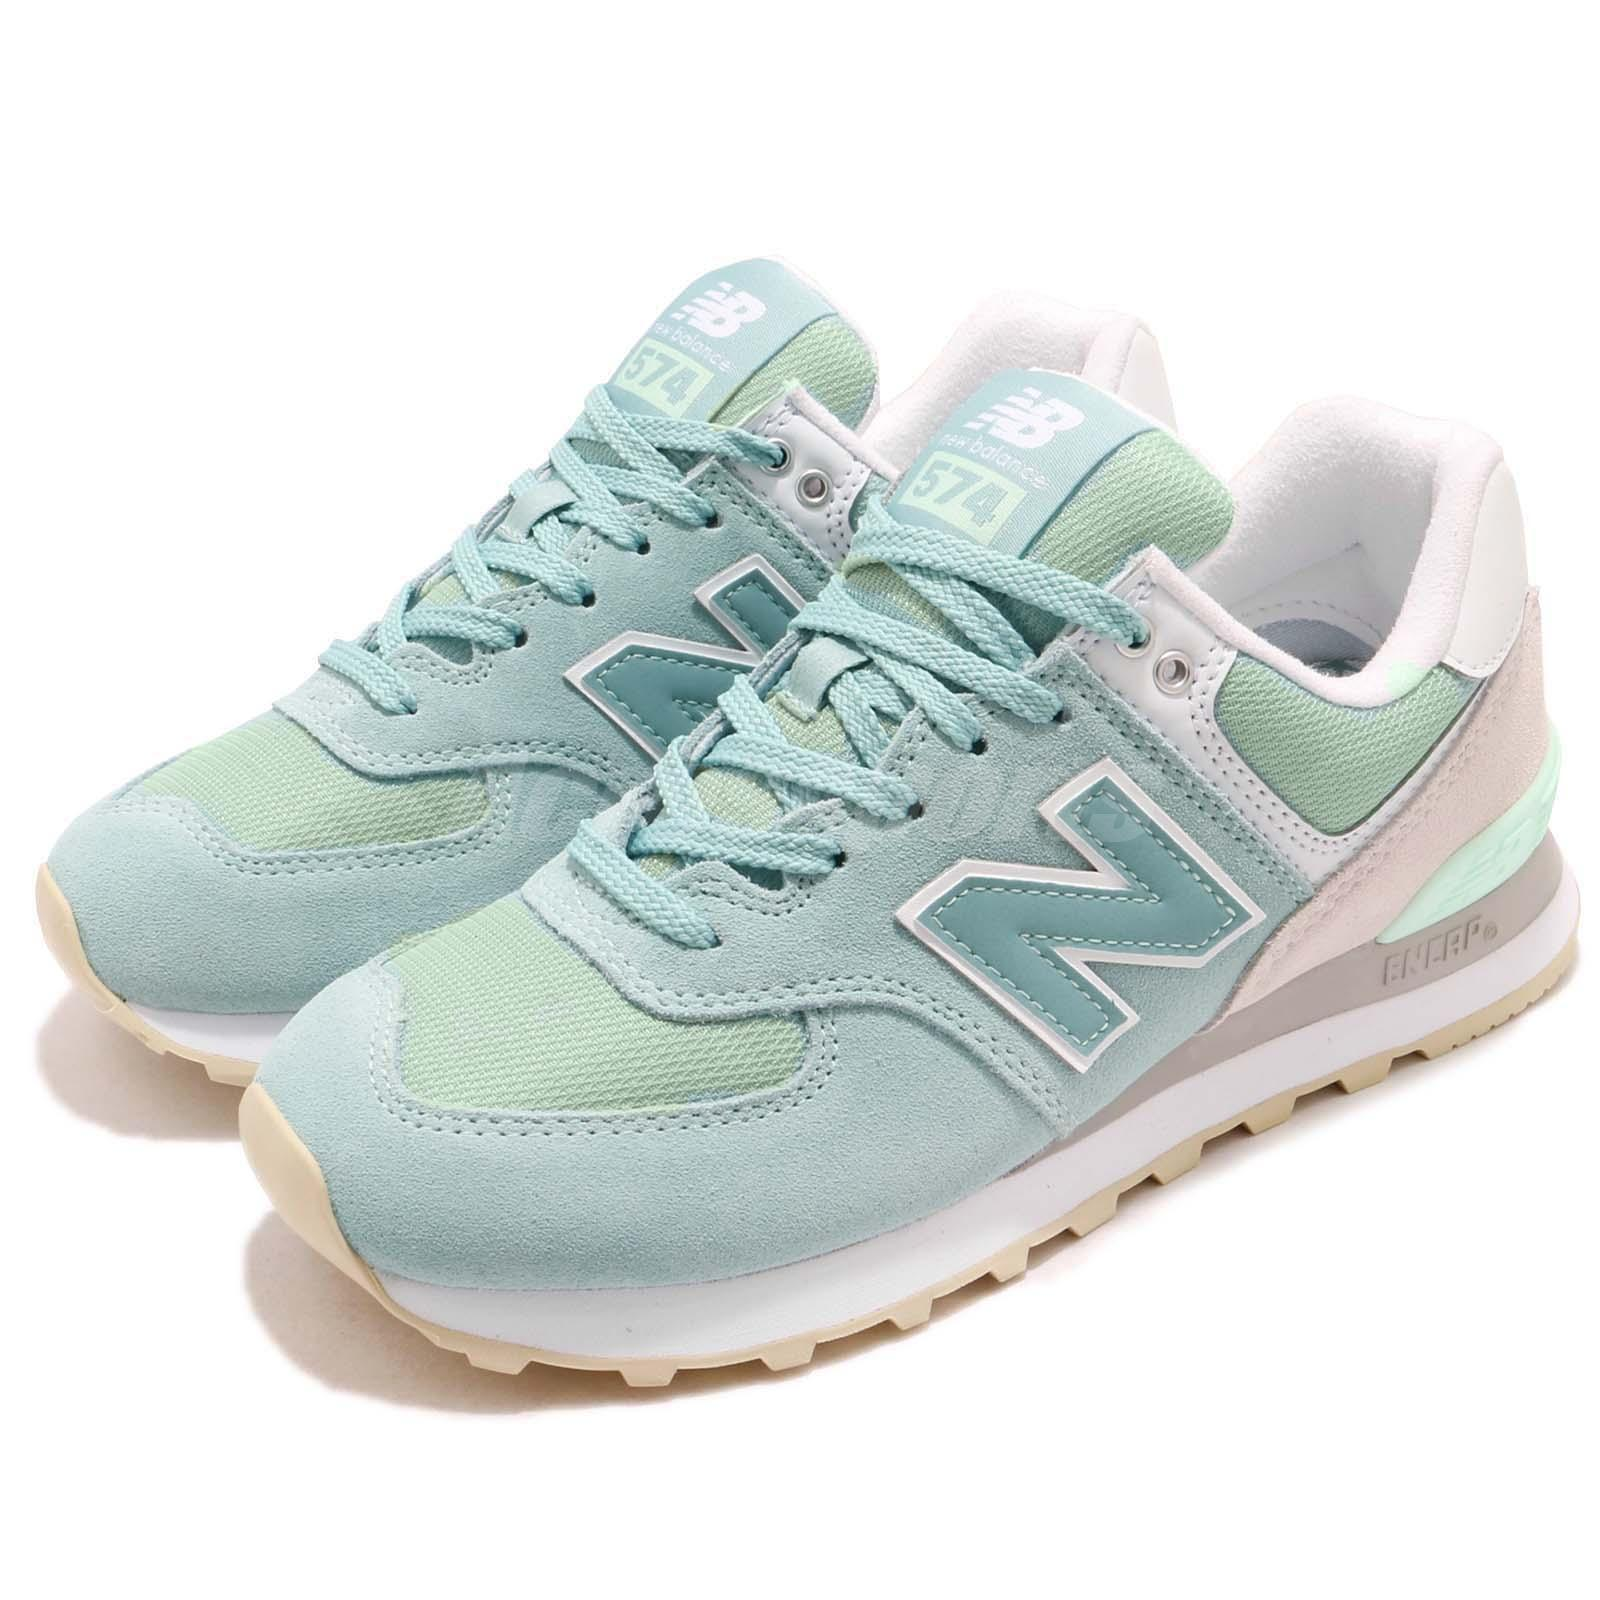 New Balance WL574TAB B vert  Gris chaussures  blanc Femme fonctionnement chaussures Gris Baskets WL574TABB 8f2db0